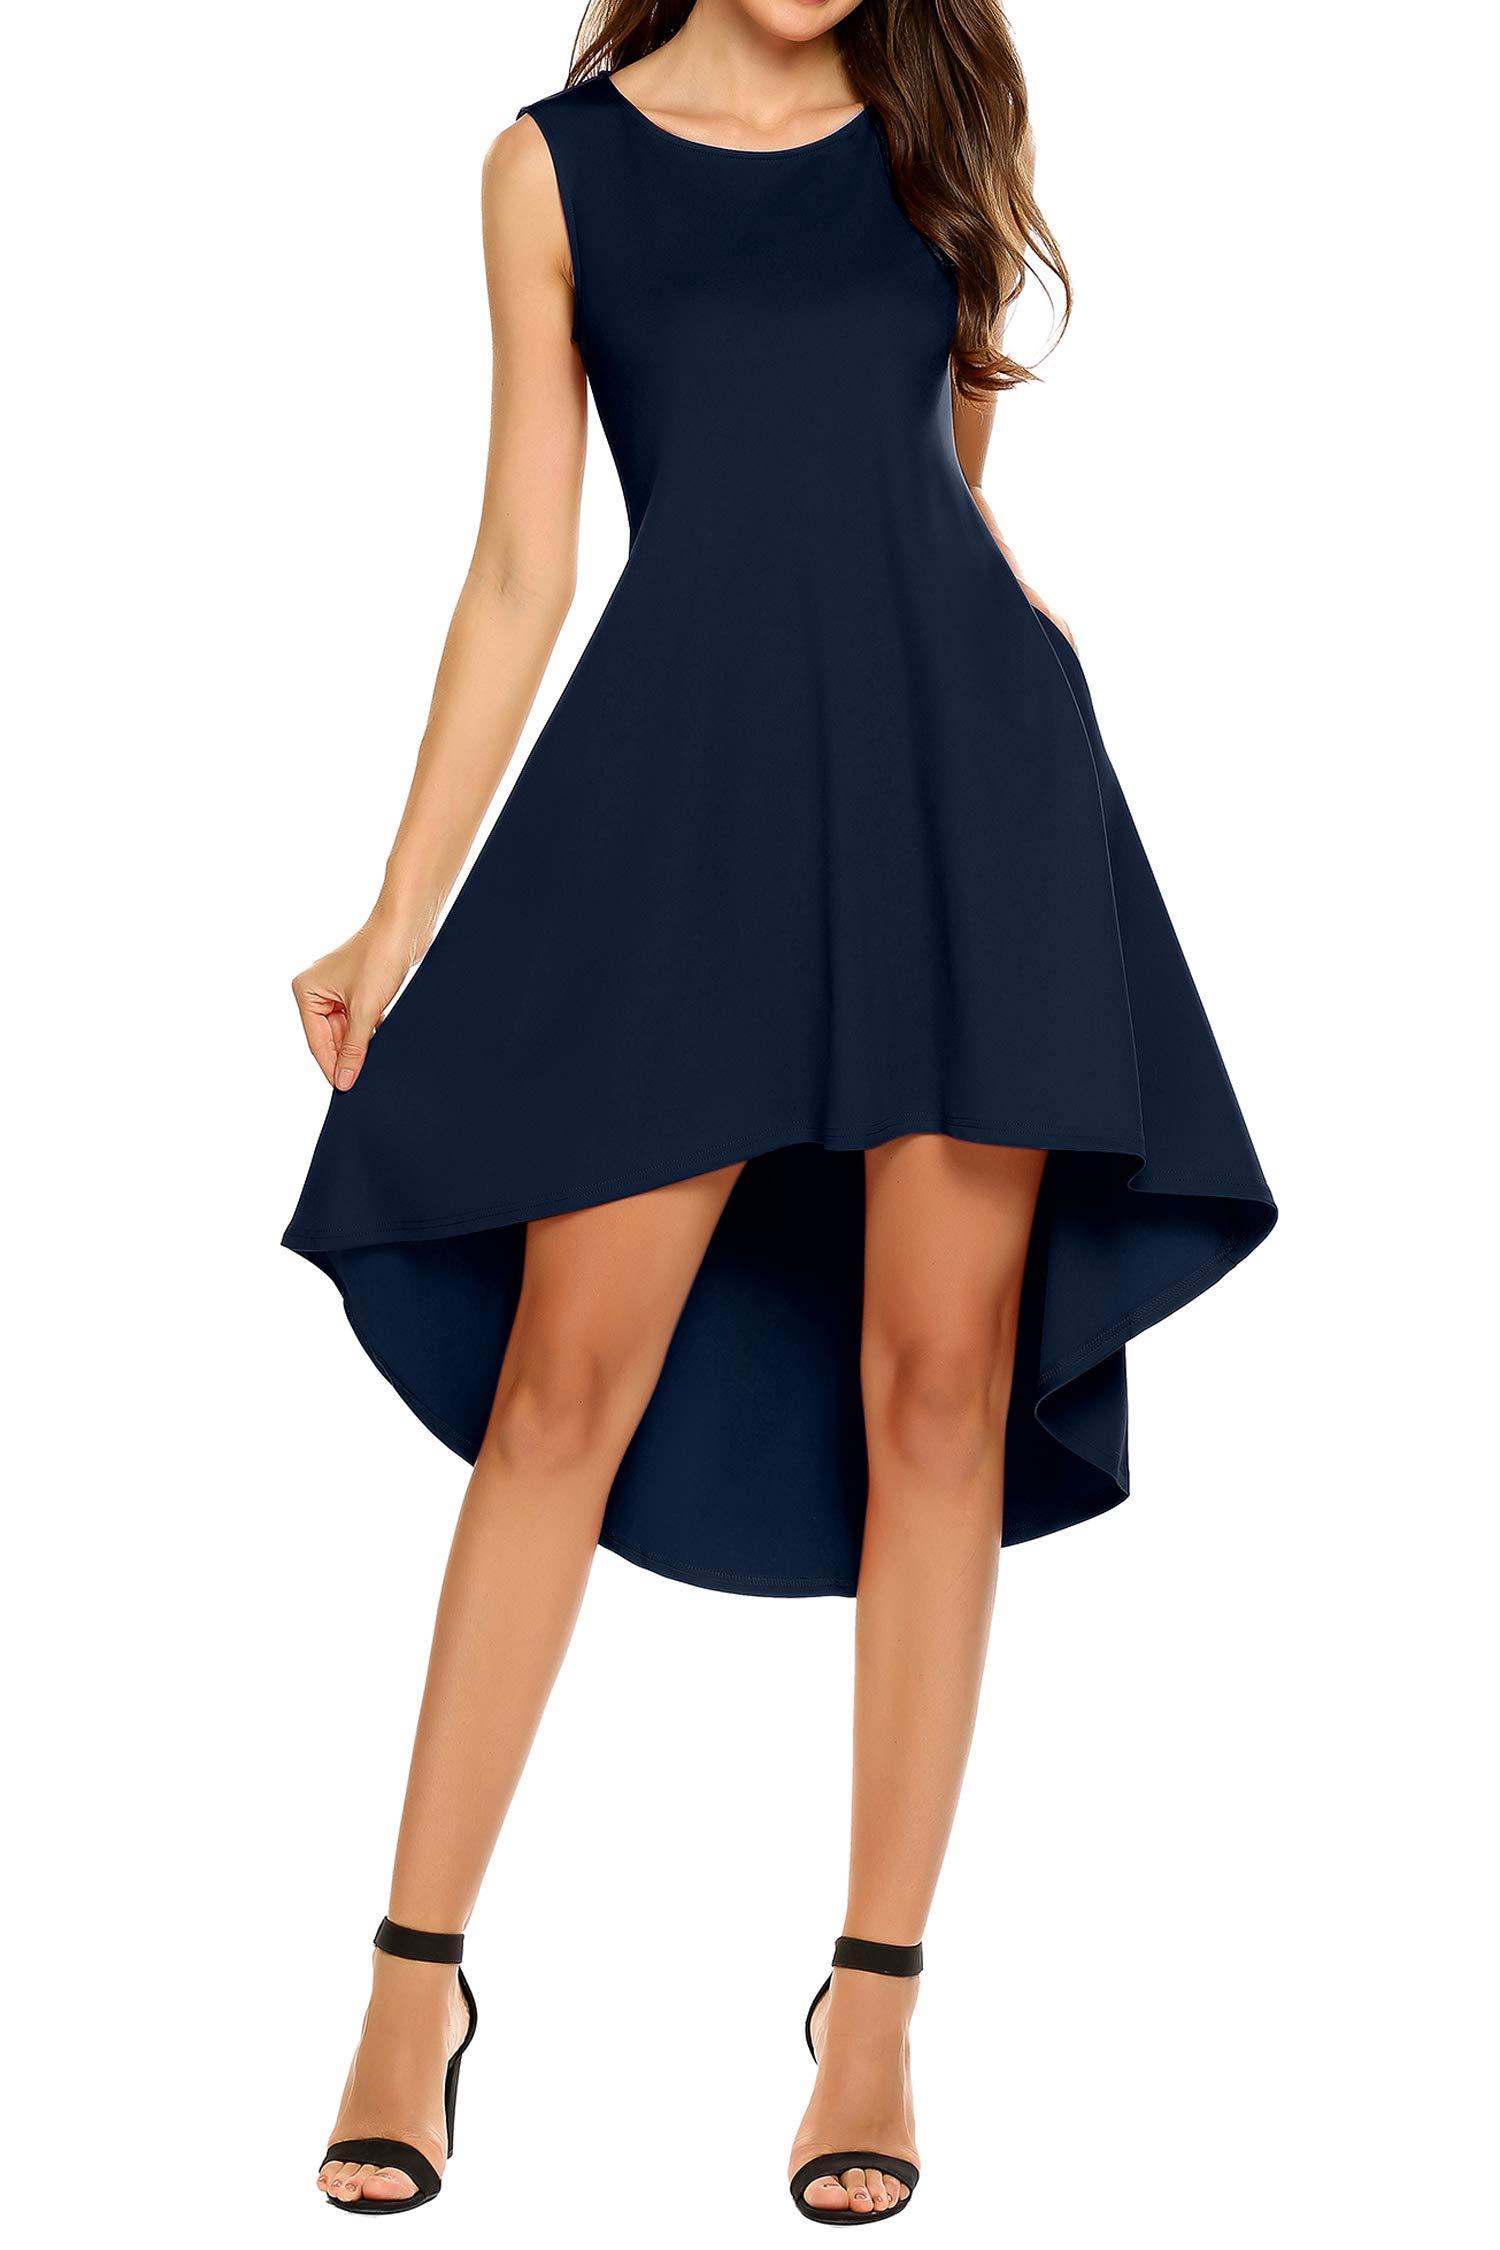 Ein Kleid im Fokuhila-Style